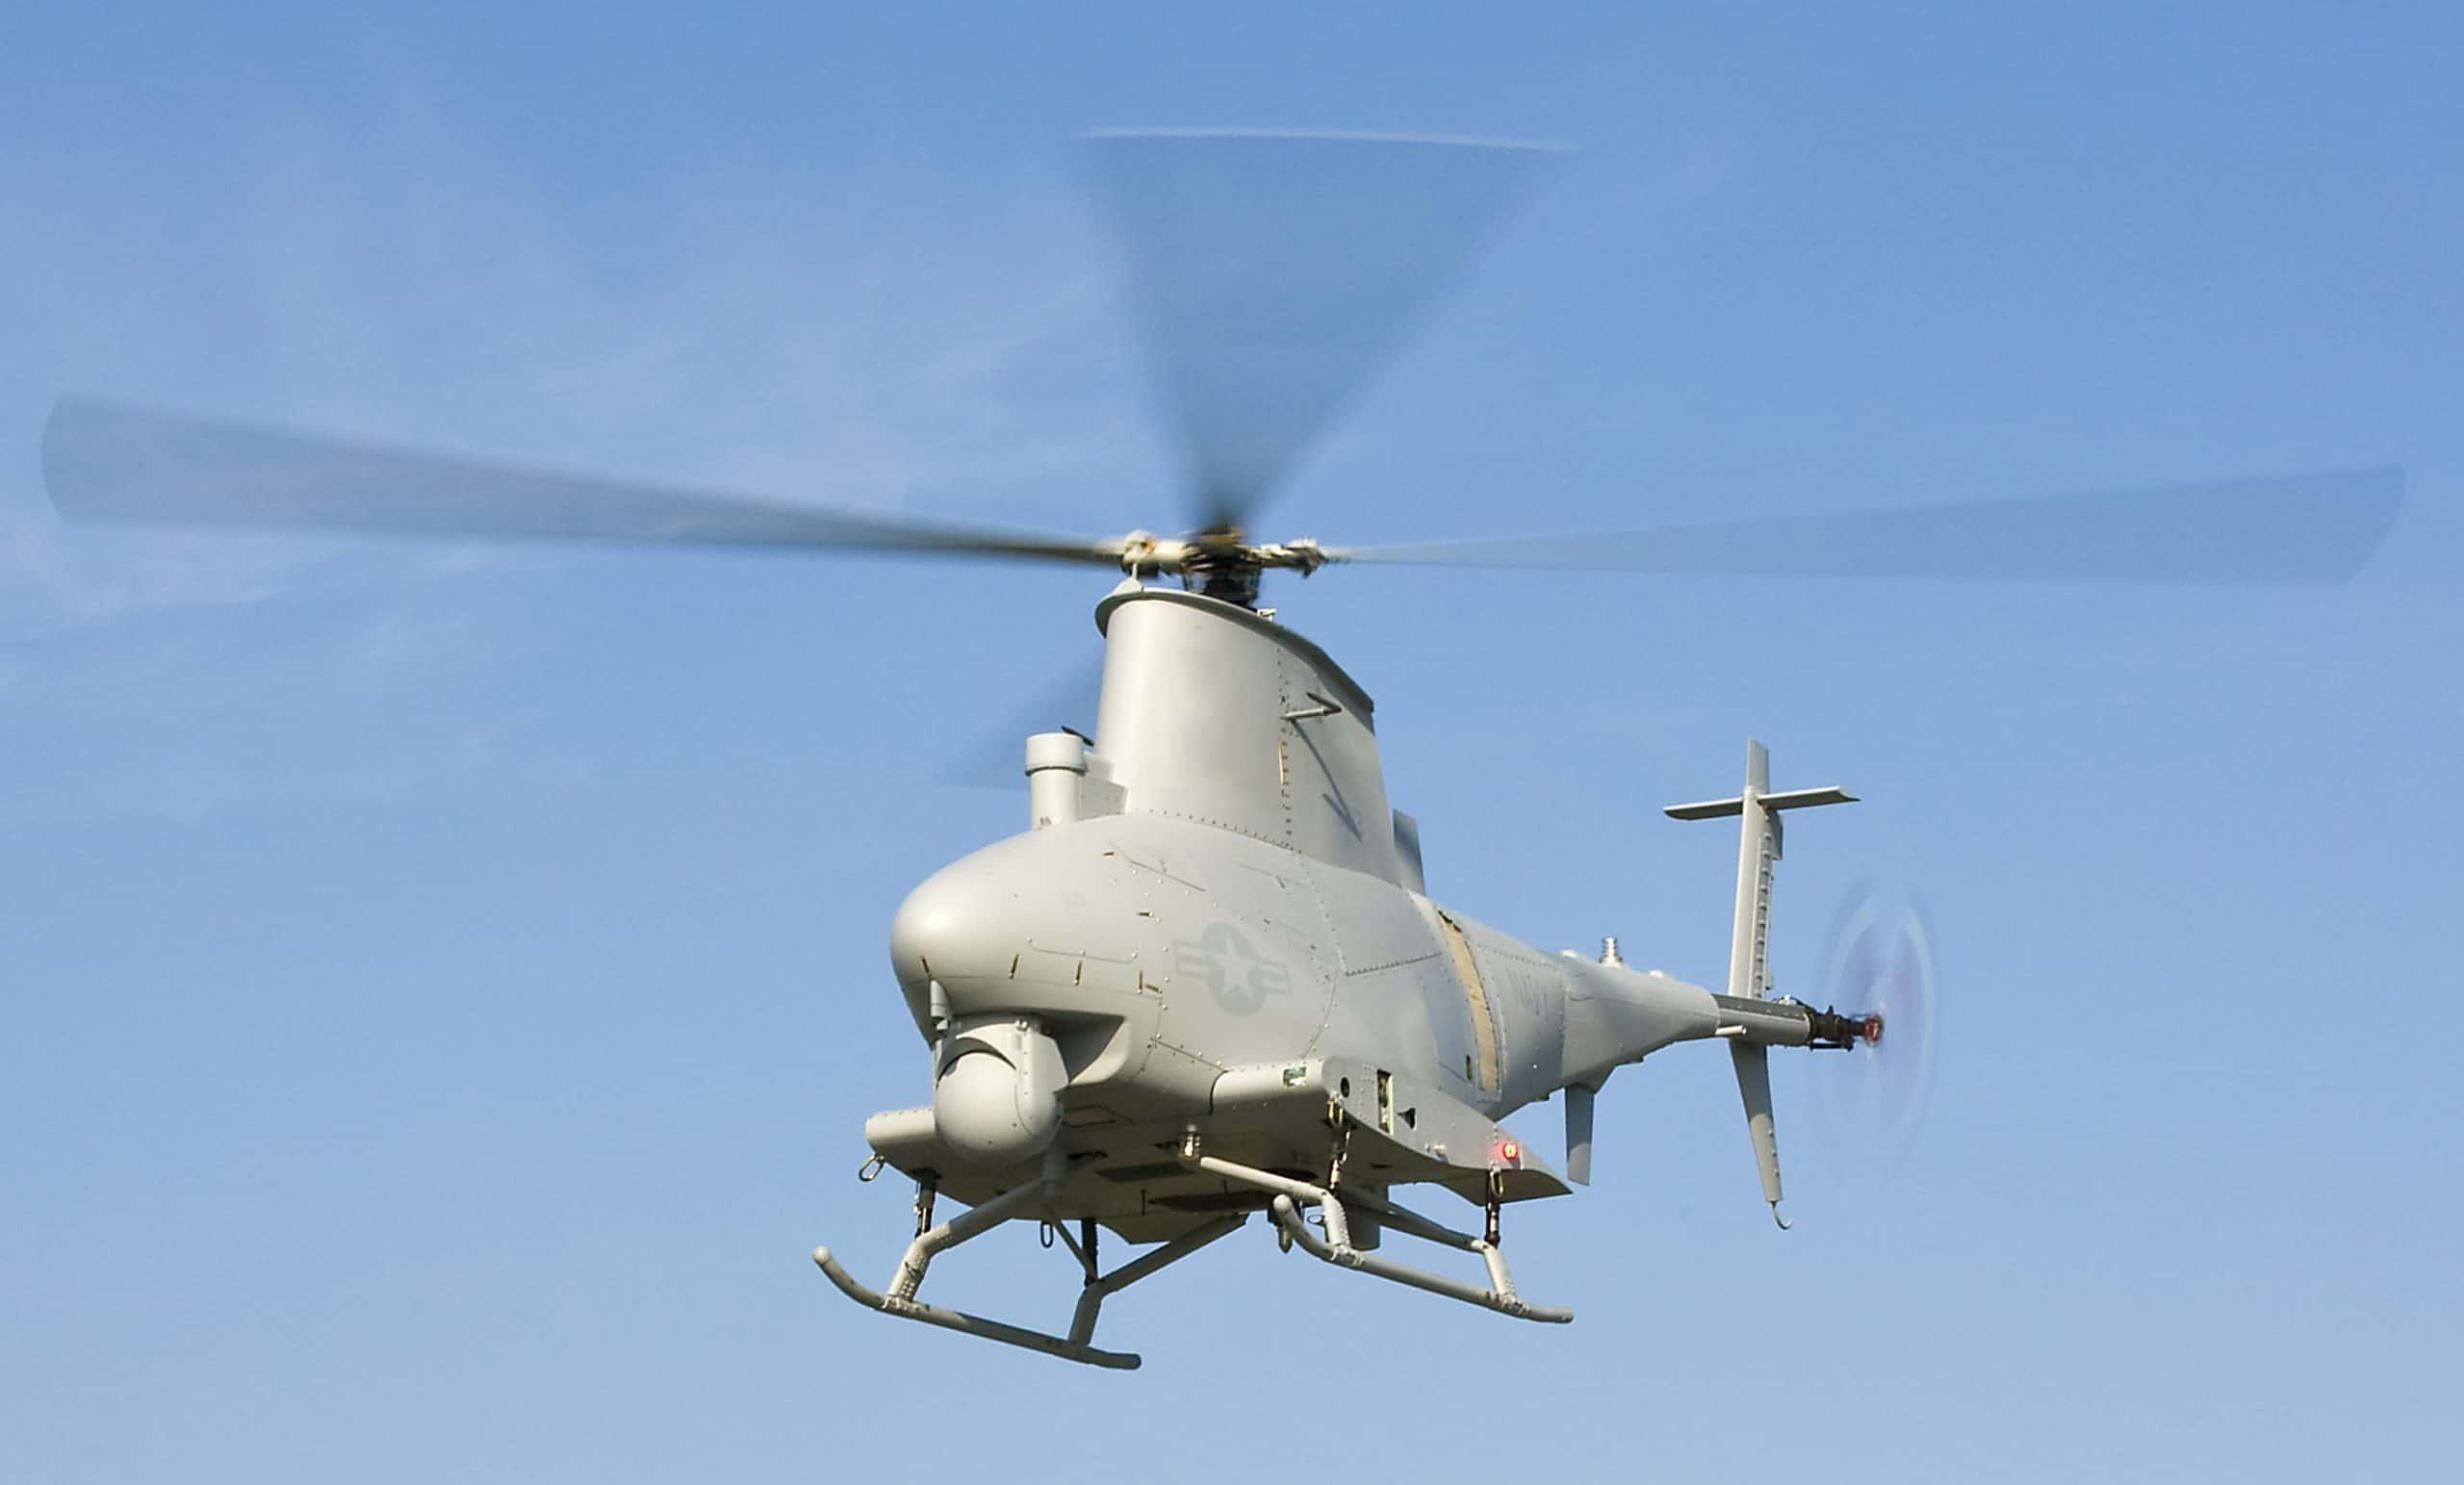 Northrop Grumman MQ-8 Fire Scout — база для лазерної системи сканування приповерхневих вод